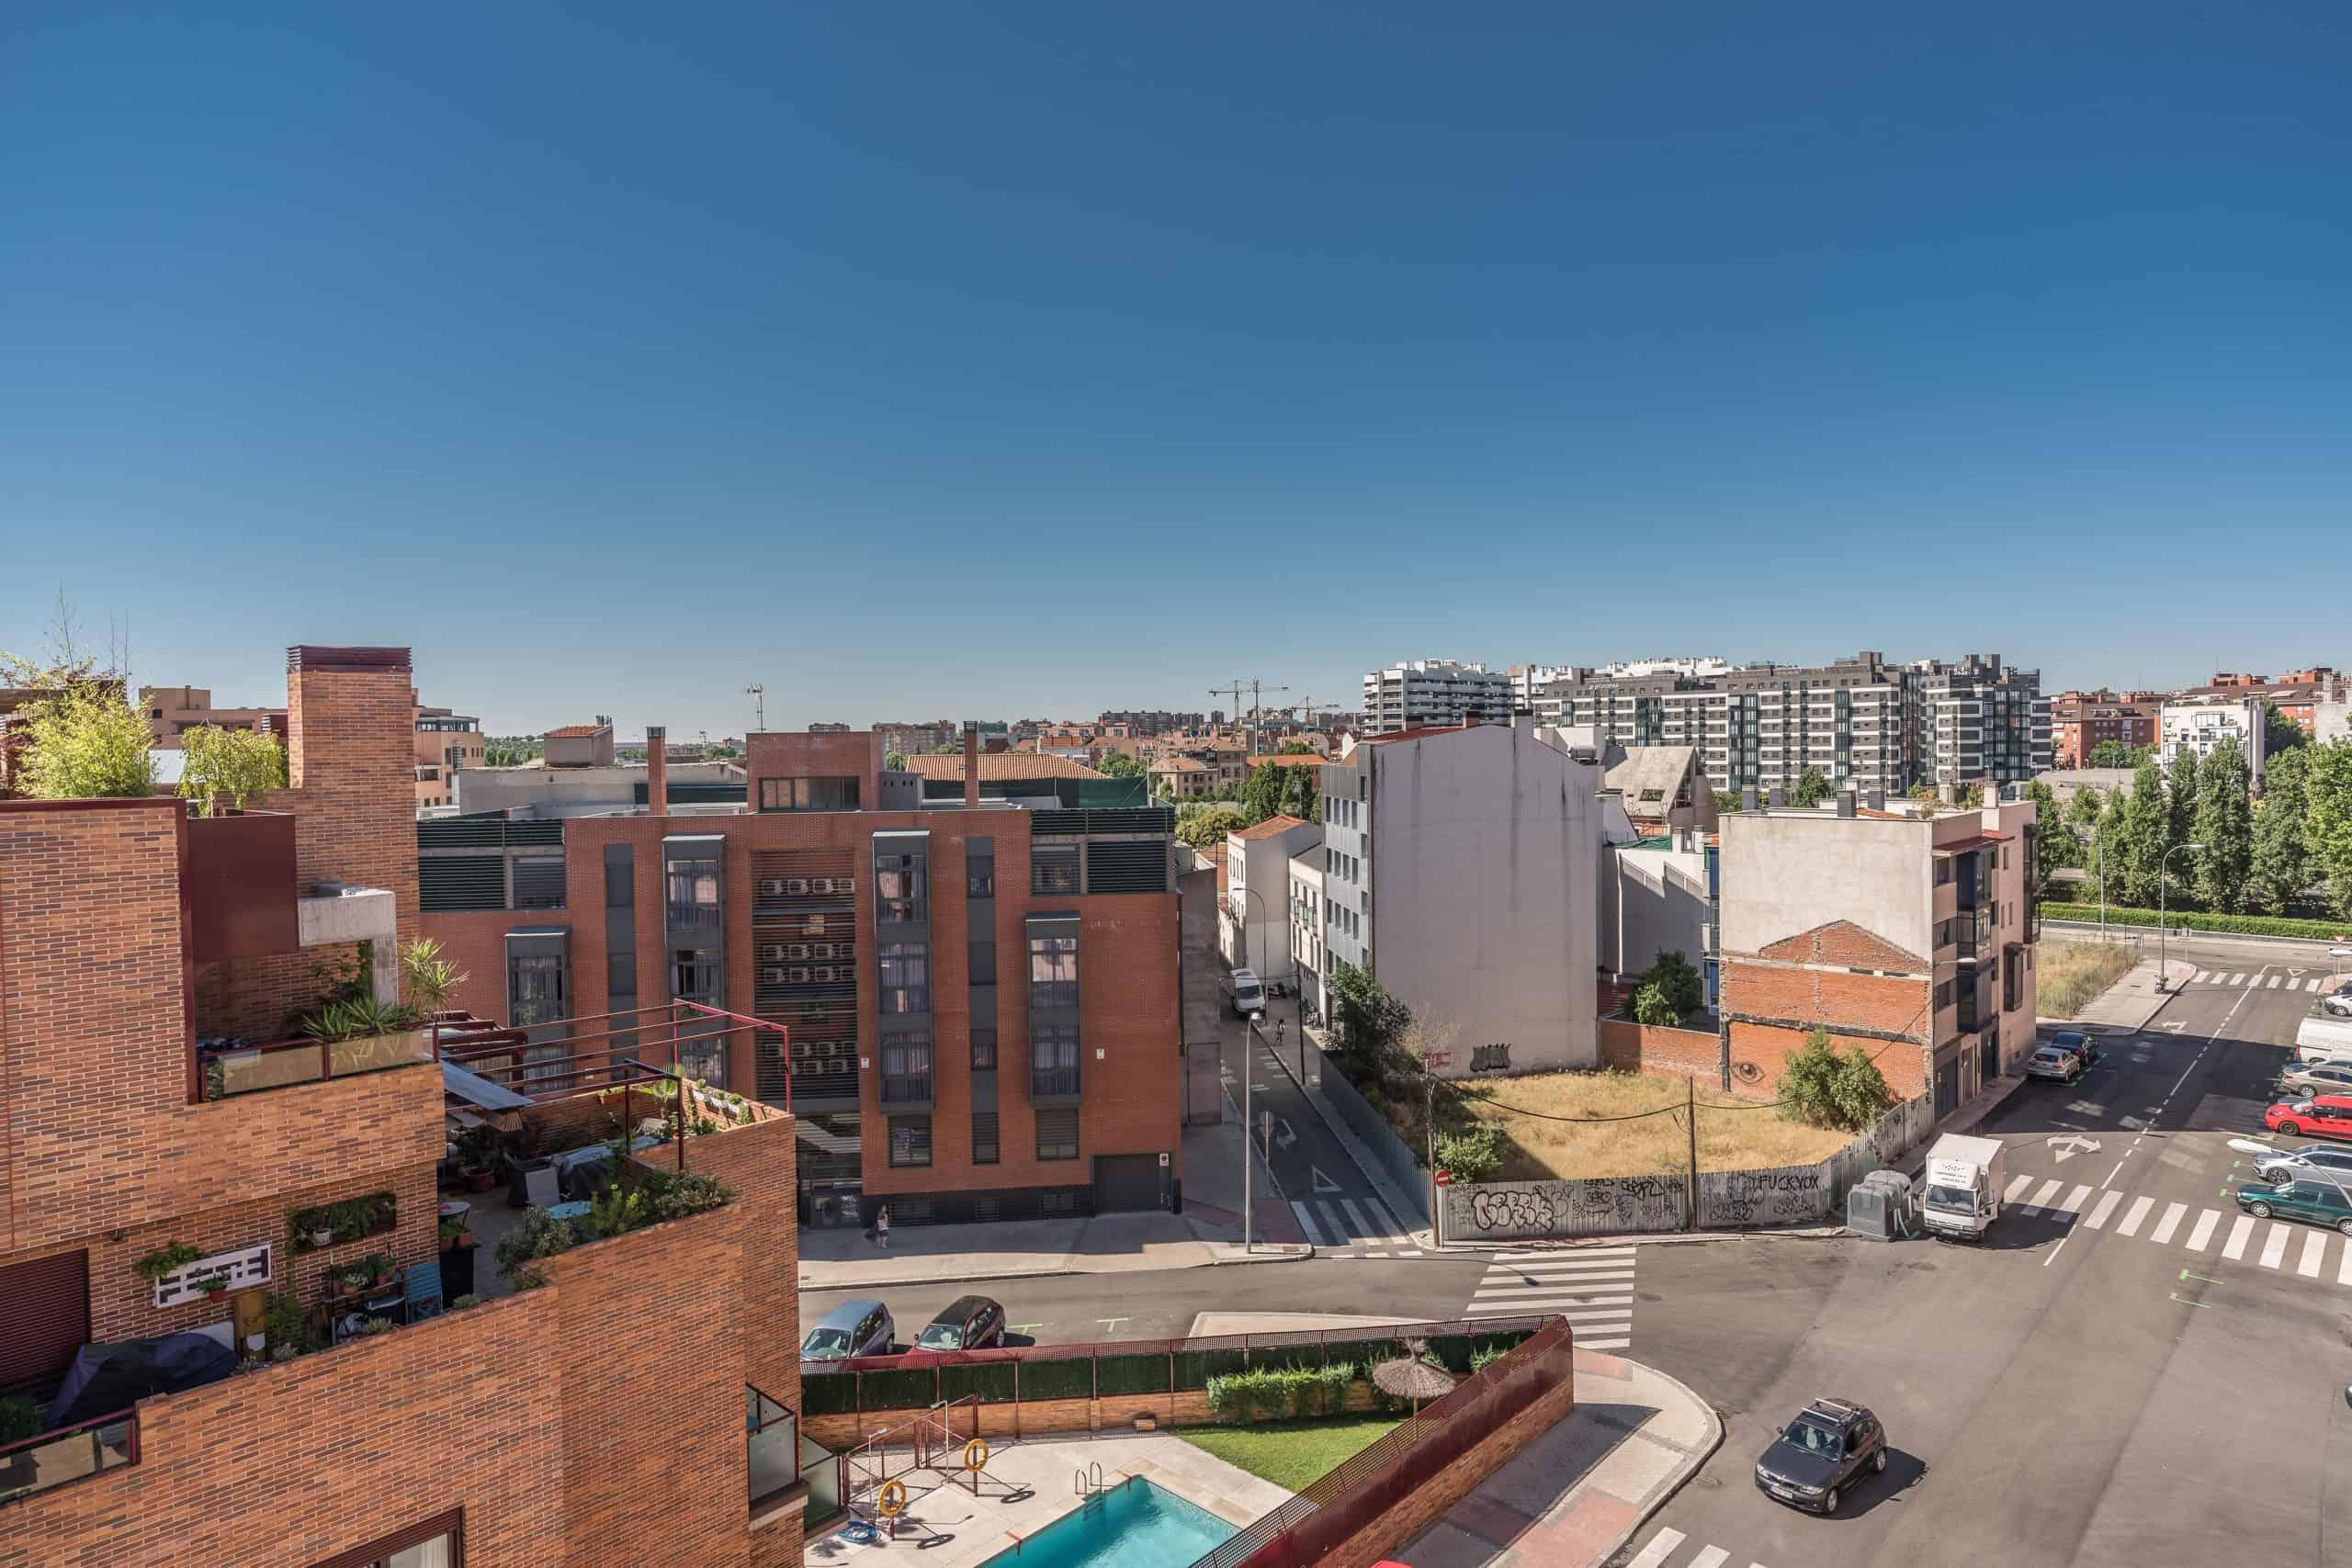 Agencia Inmobiliaria de Madrid-FUTUROCASA-Zona ARGANZUELA-EMBAJADORES-LEGAZPI13 VISTAS (1)